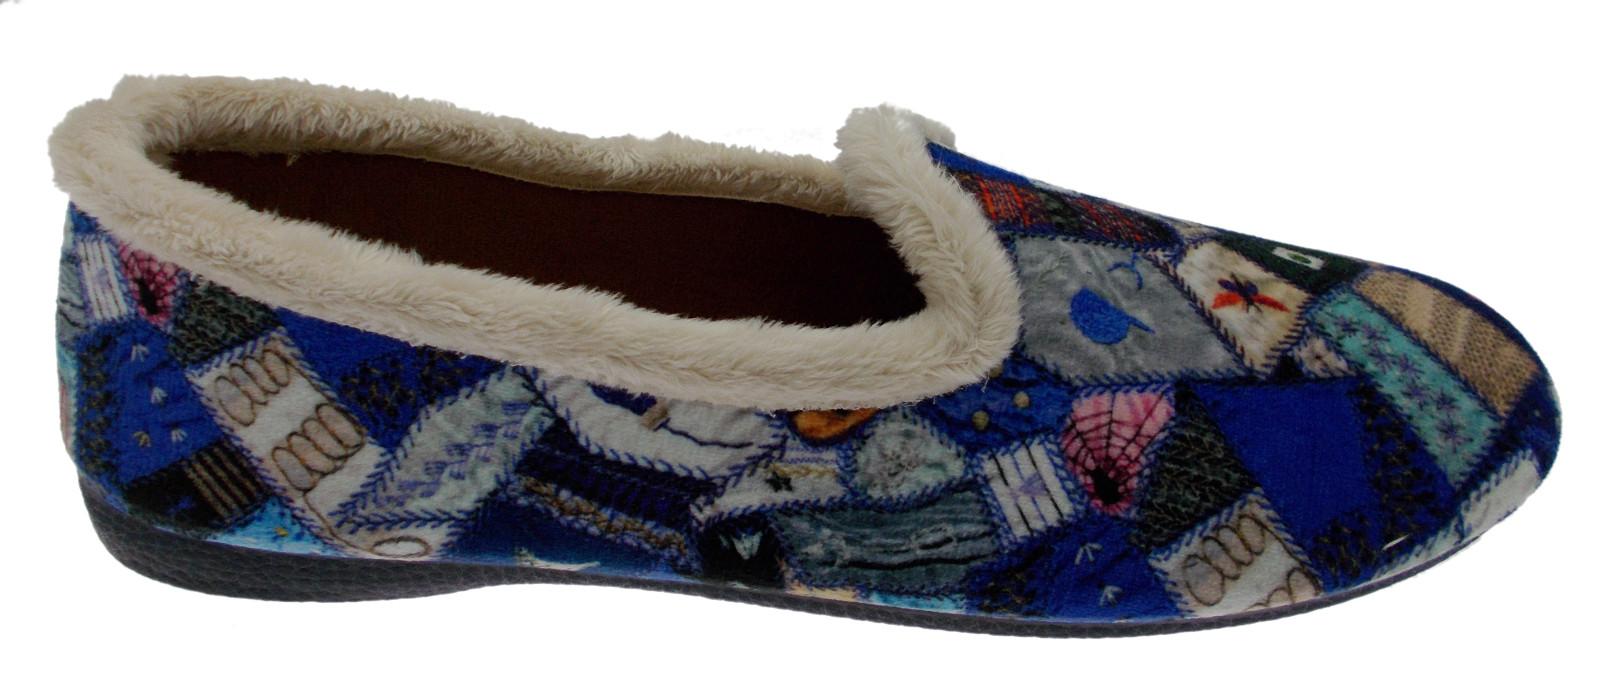 bluee slipper fantasy patchwork art 4138 Riposella